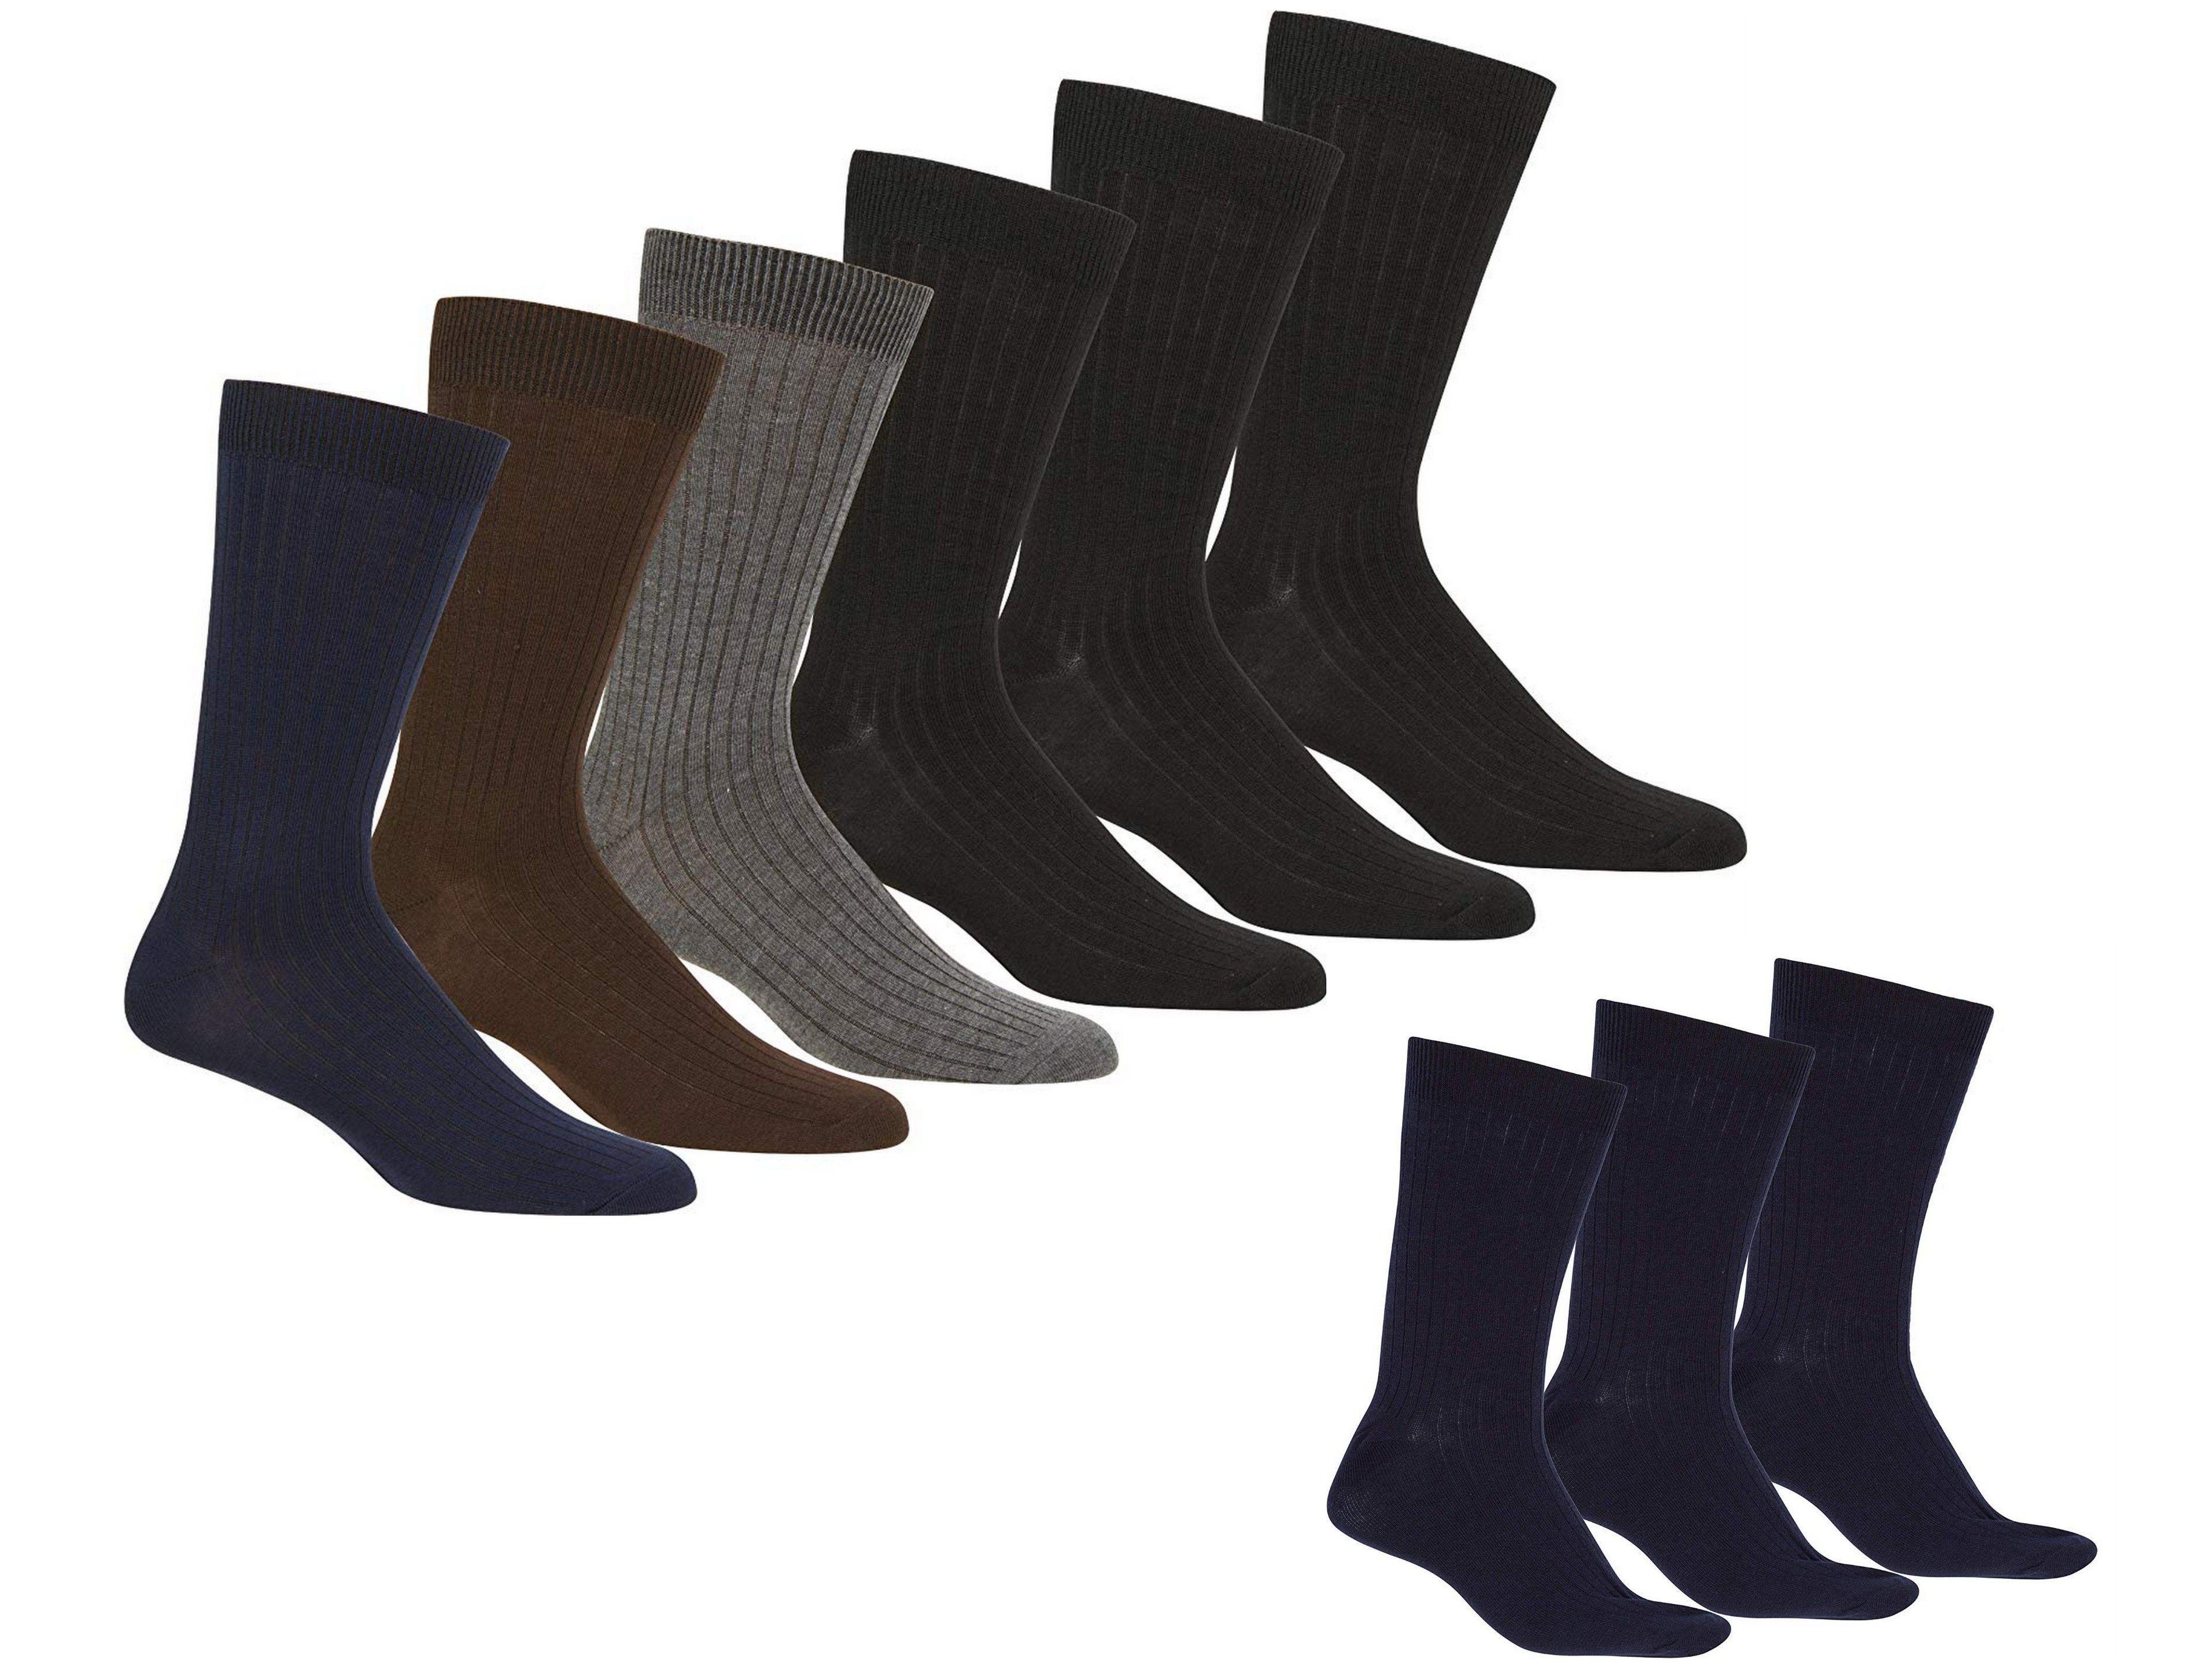 Sakkas Men S Cotton Blend Ribbed Dress Socks Socks And Hosiery Hosiery Dress Socks [ 2878 x 3784 Pixel ]